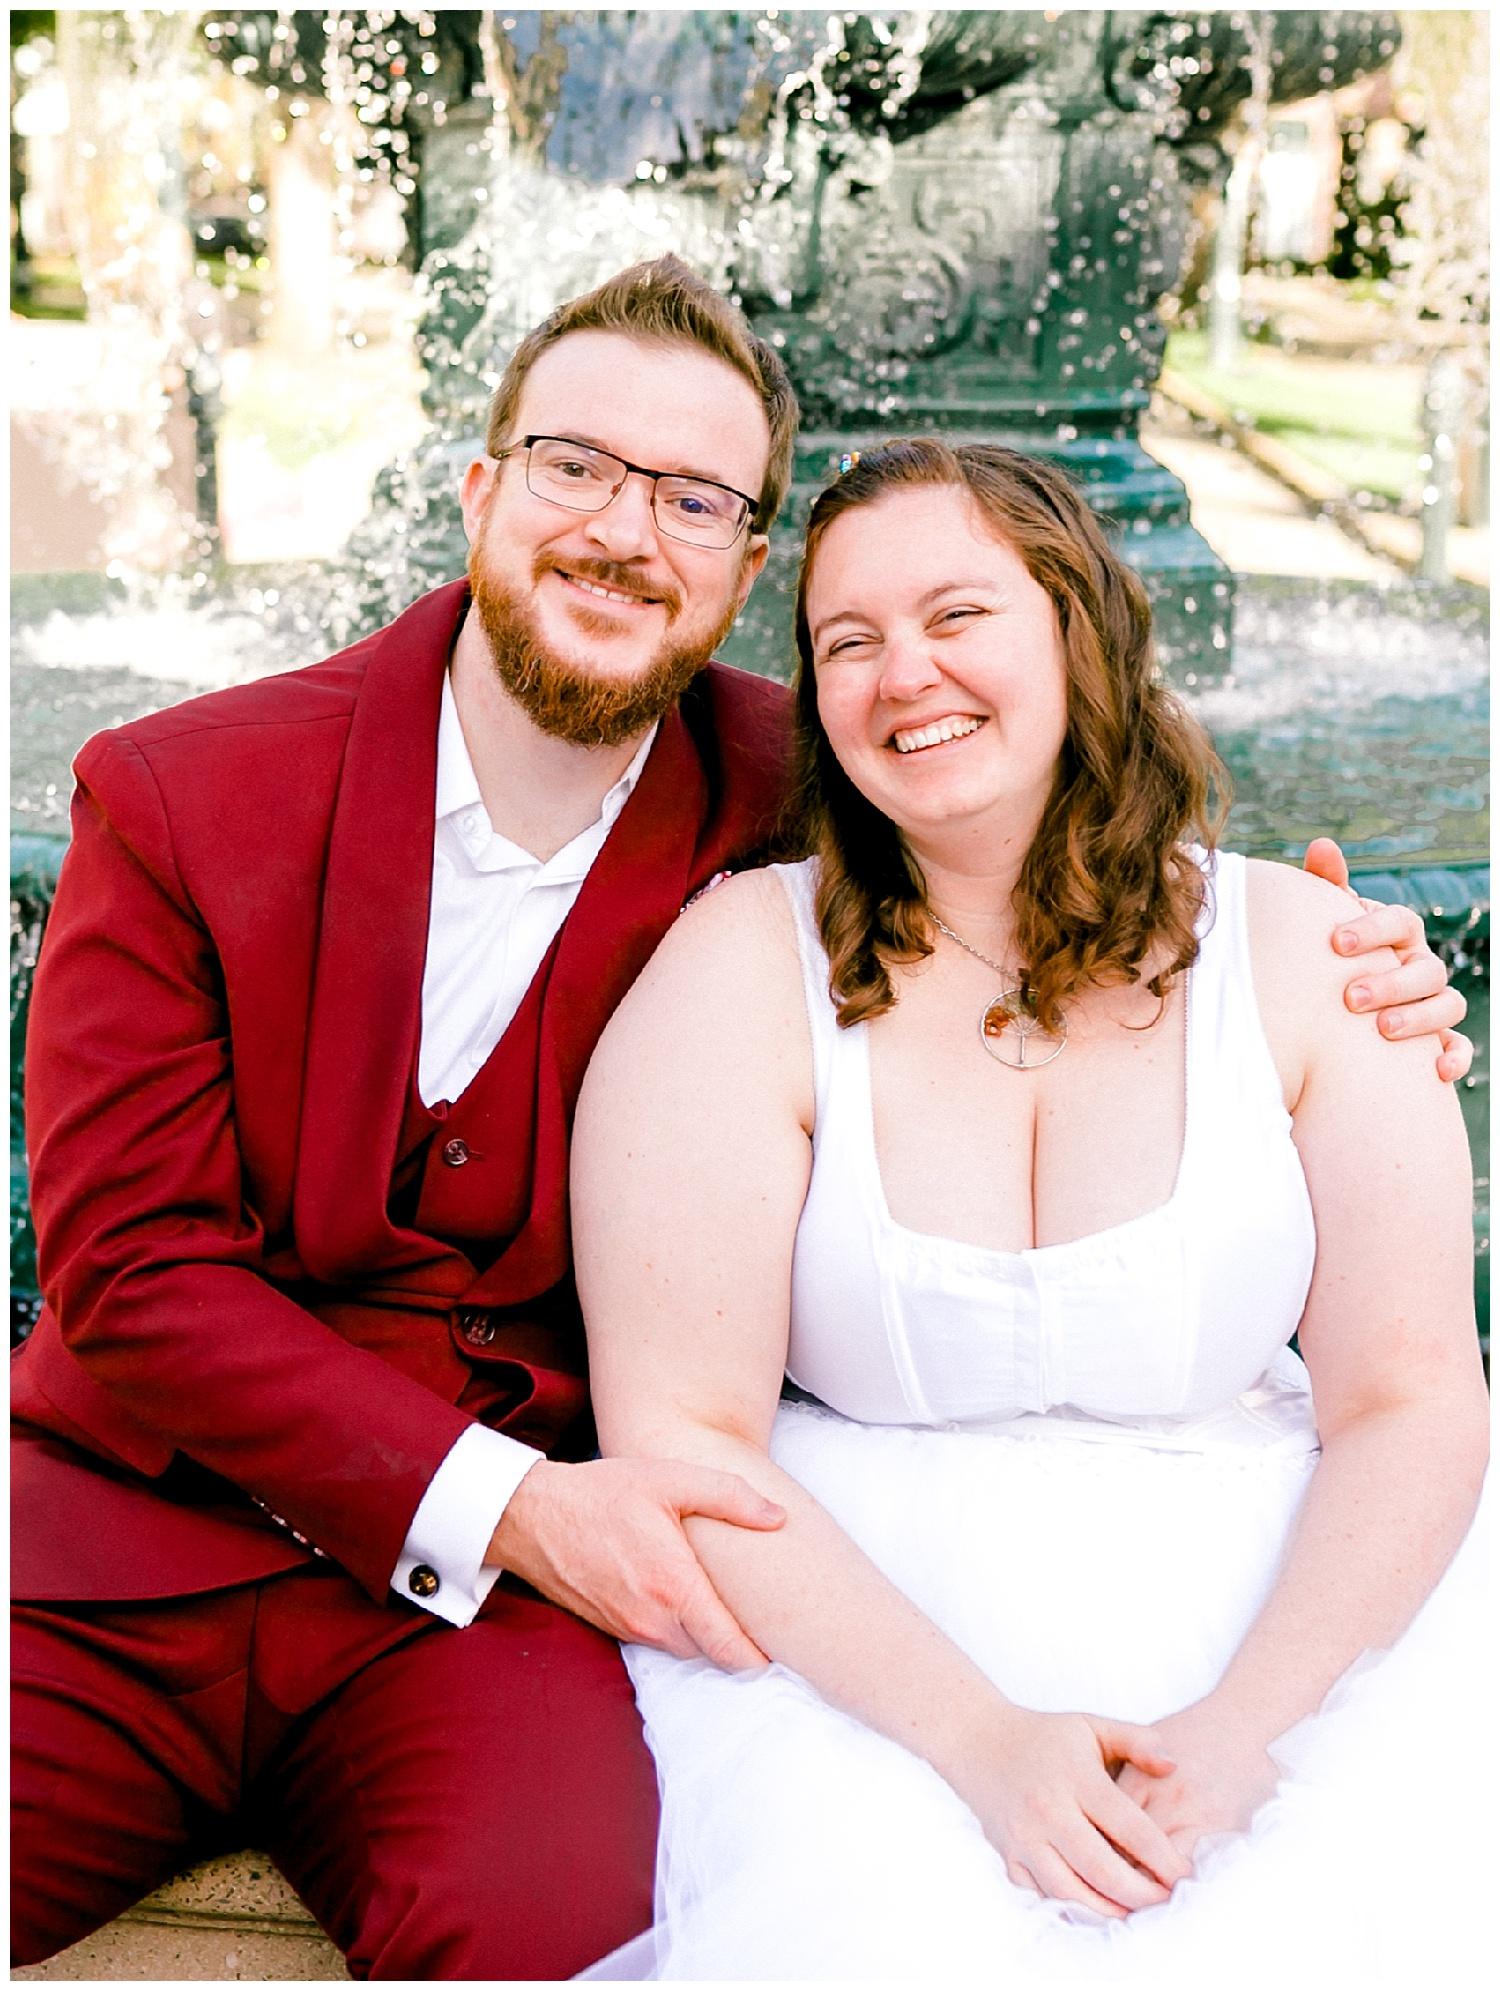 Maui-Wedding-Photographer-Destination-Wedding_0089.jpg